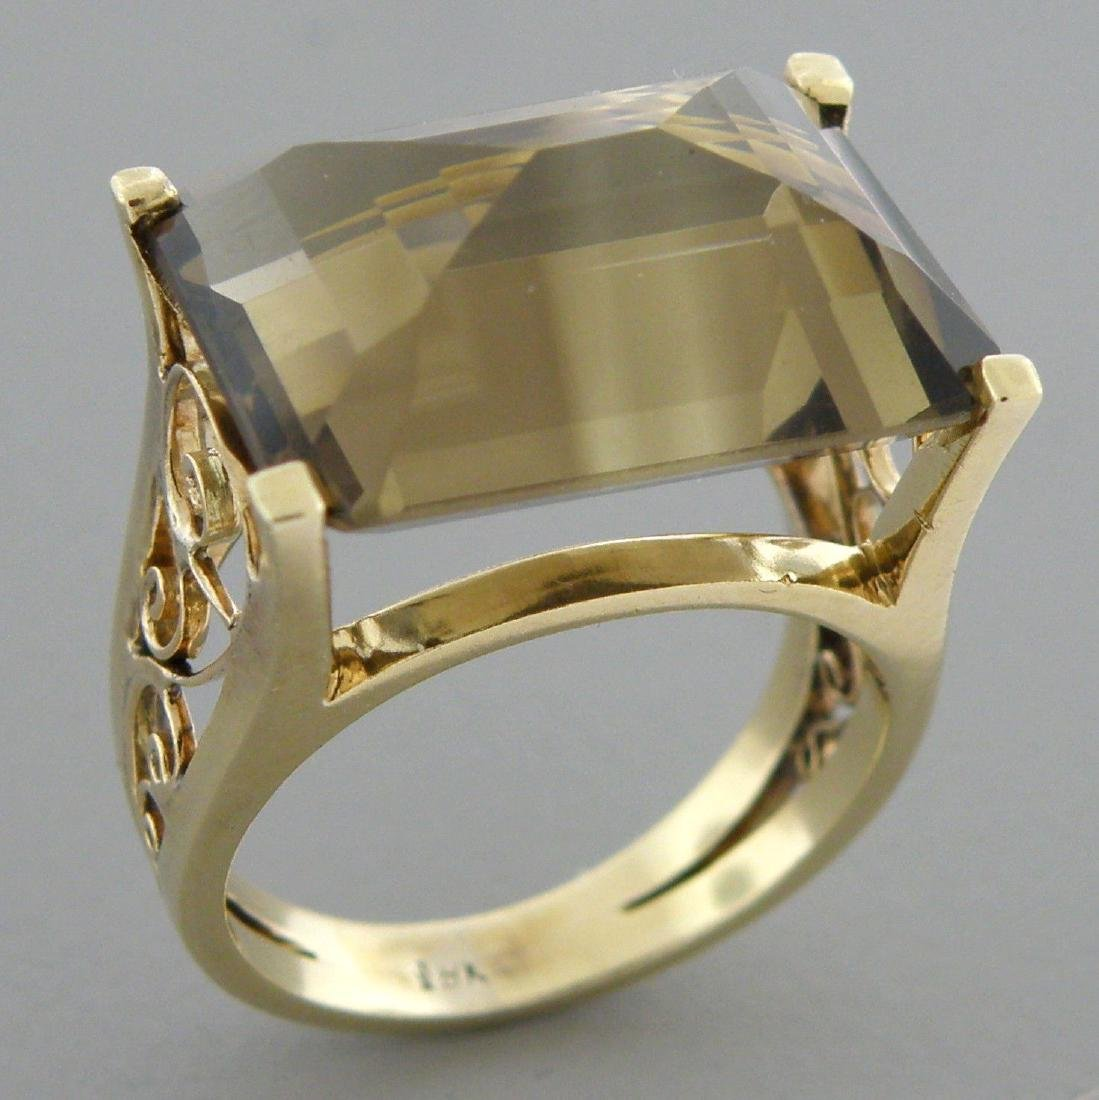 VINTAGE 18K YELLOW GOLD SMOKY TOPAZ COCKTAIL RING